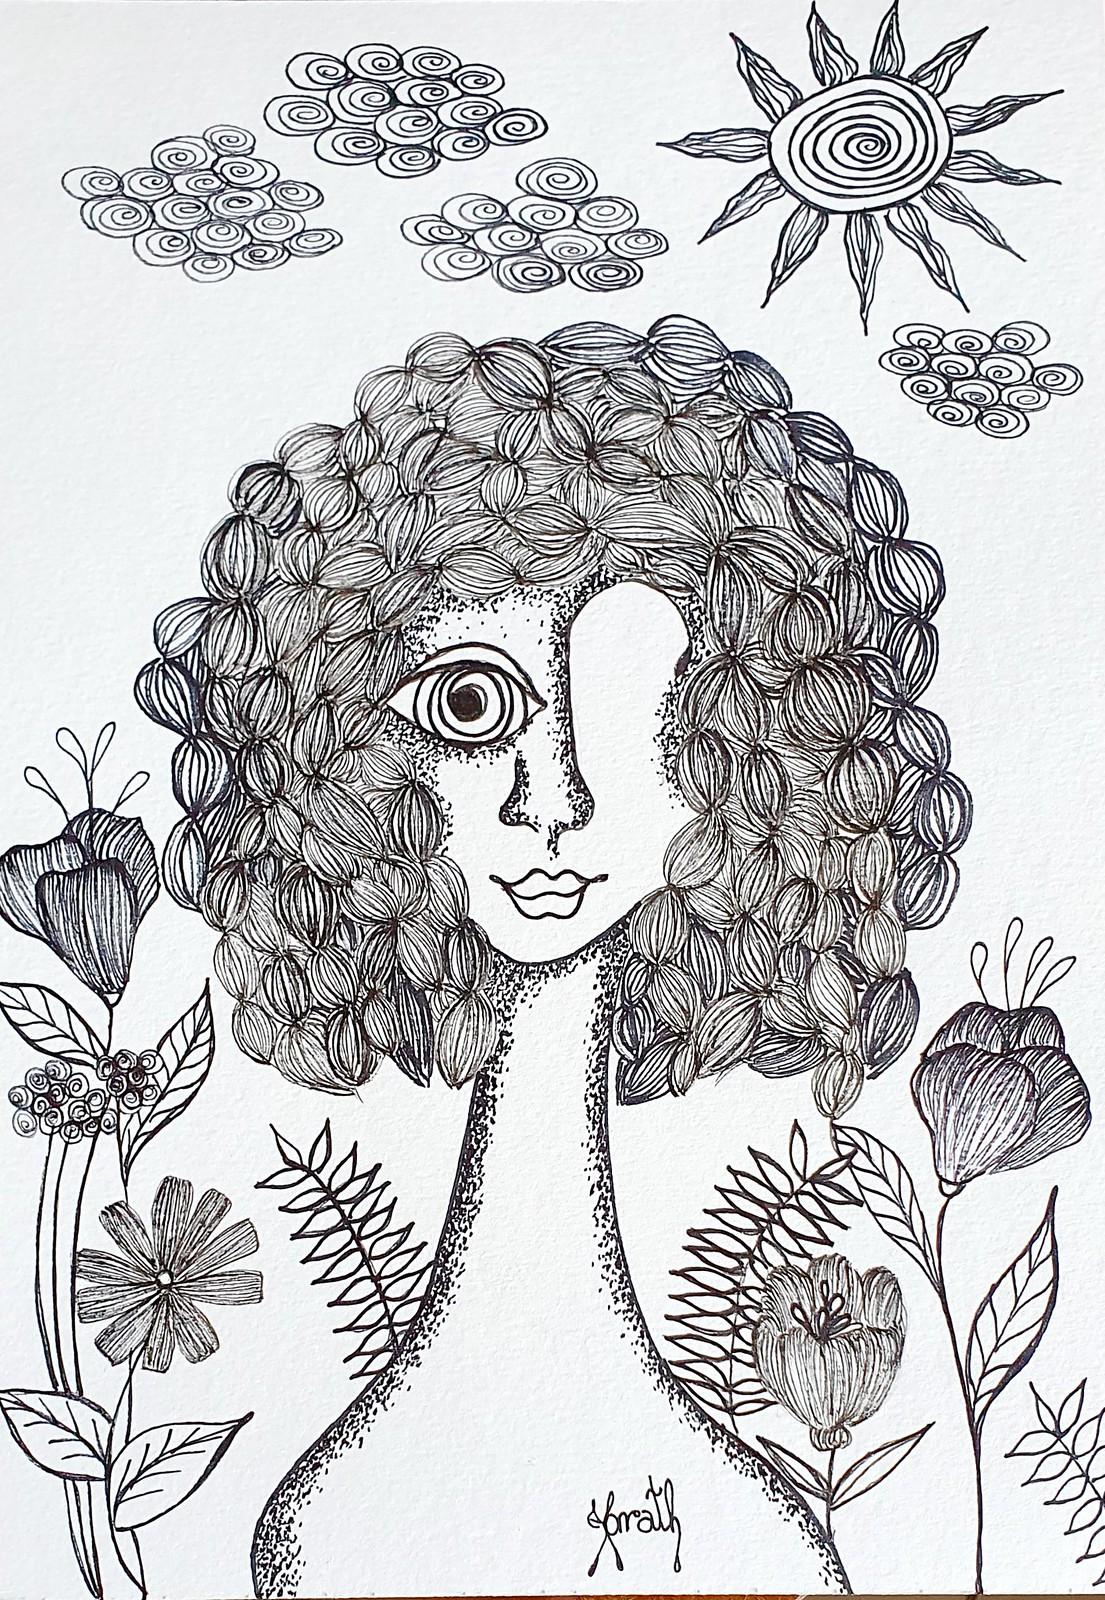 Adriana Konrath